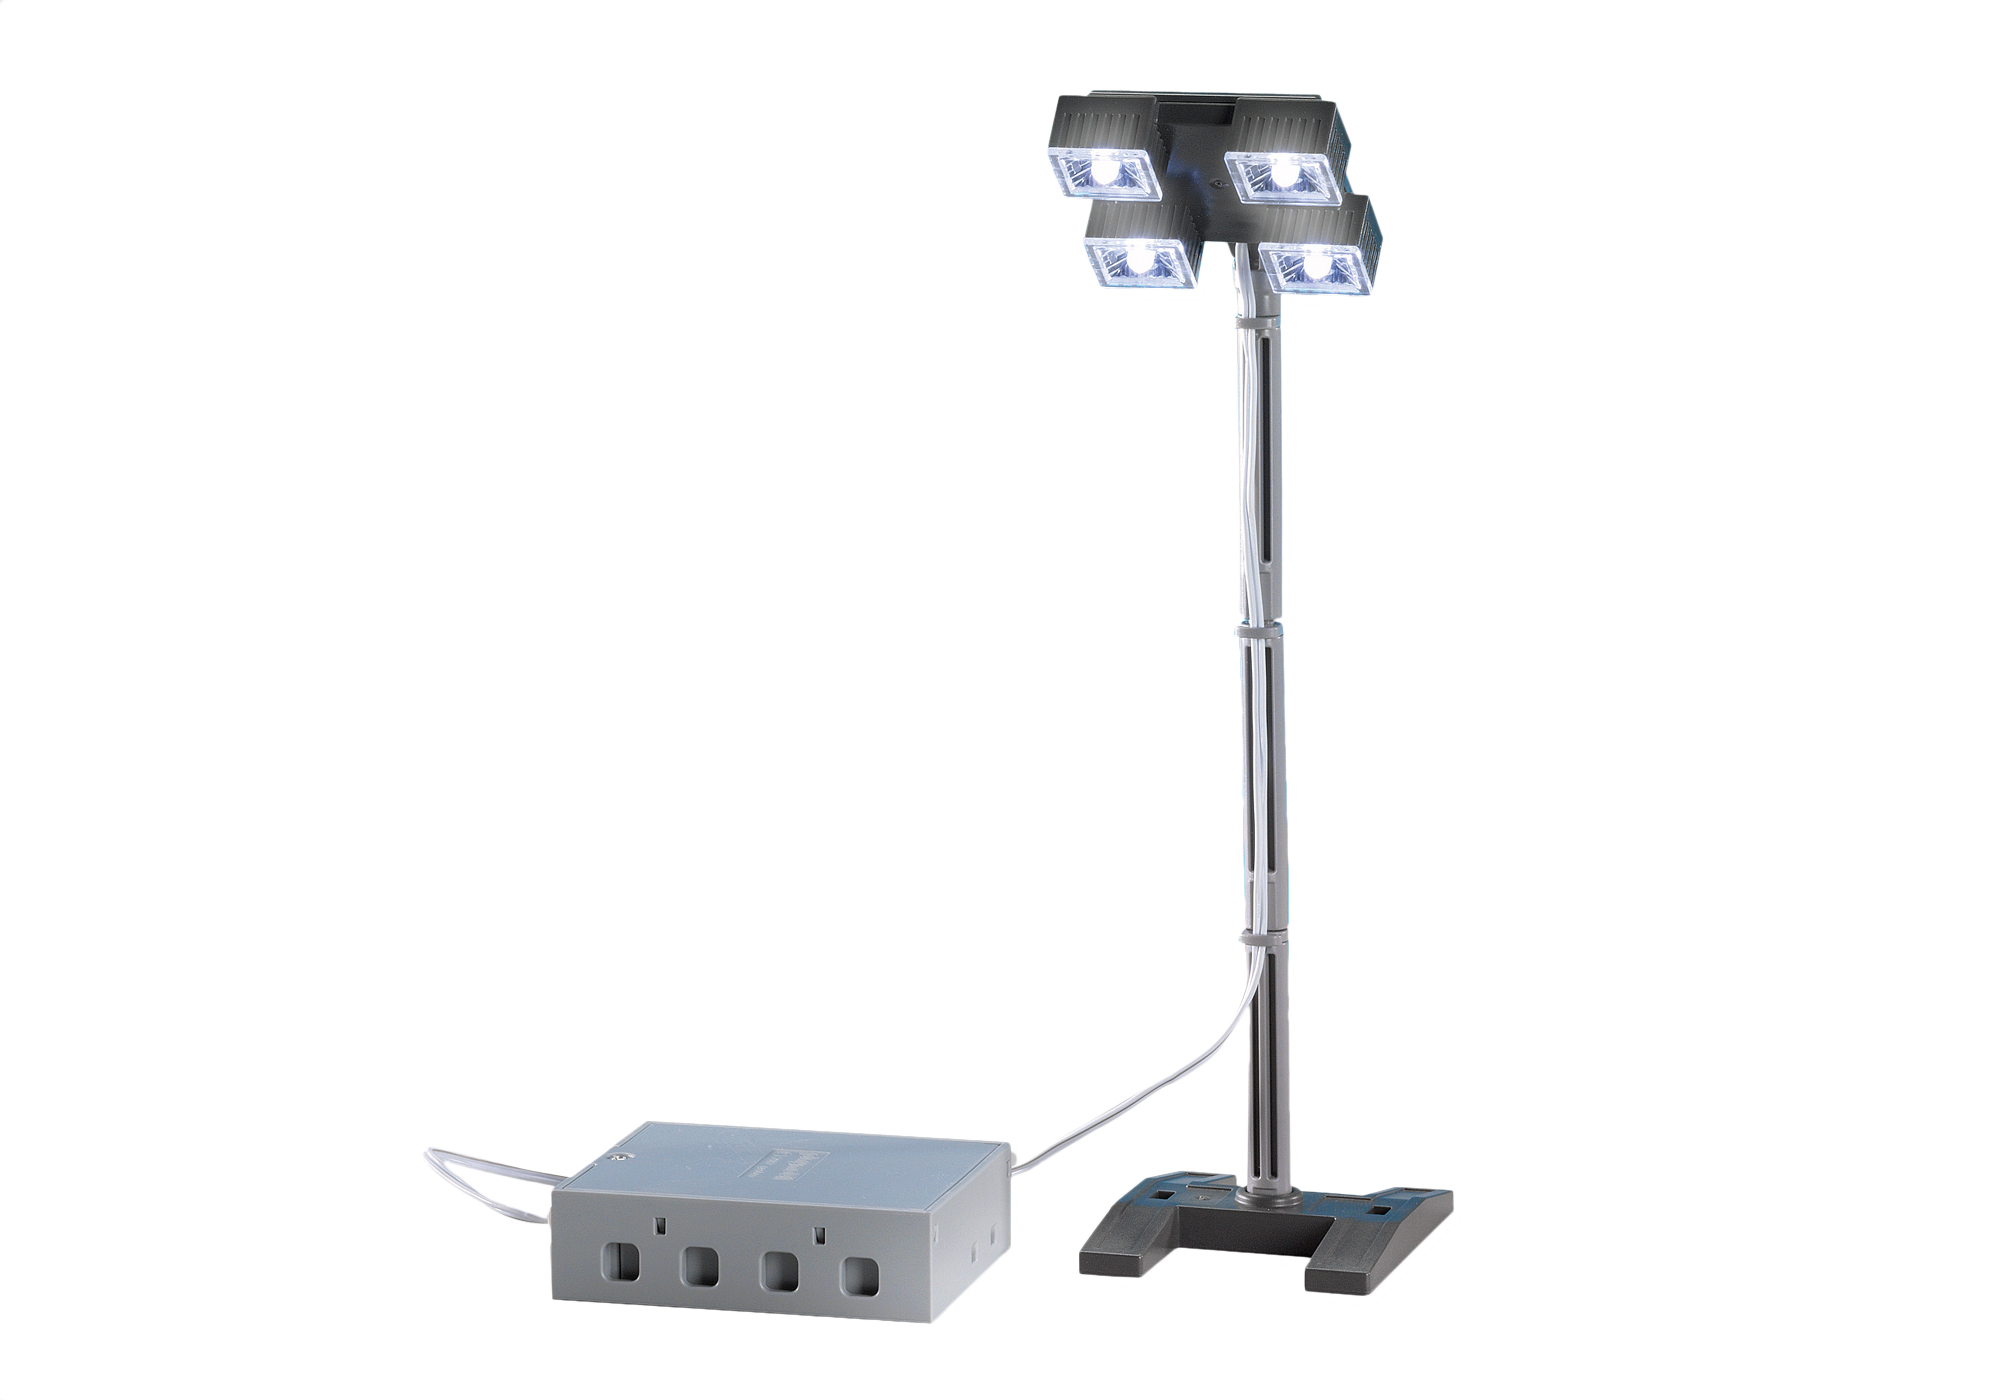 http://media.playmobil.com/i/playmobil/7445_product_detail/Floodlight